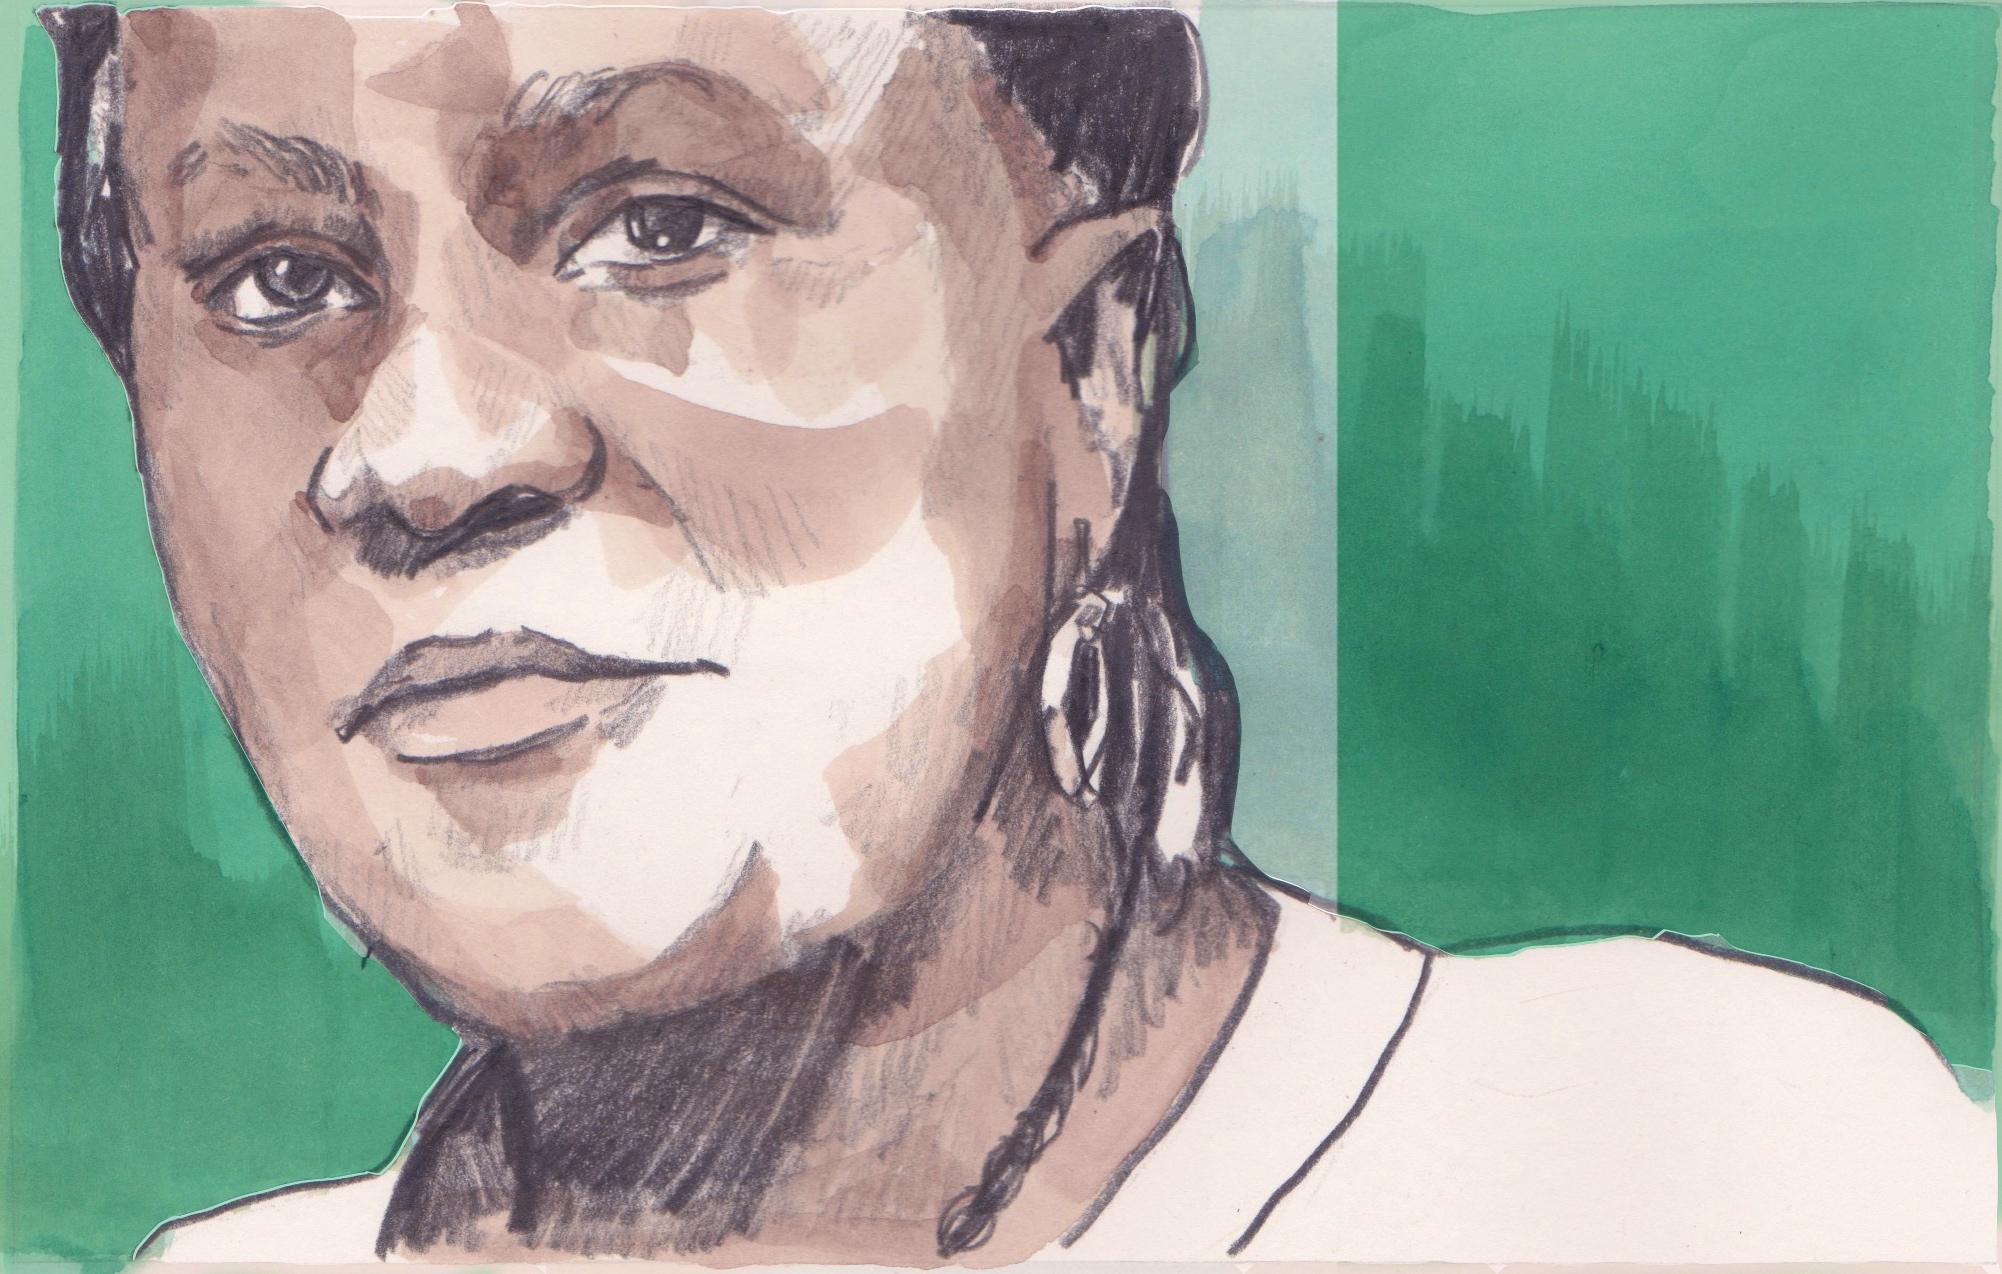 27/03/15 Professor Reni Sonaiya is the first woman to run for president in Nigeria